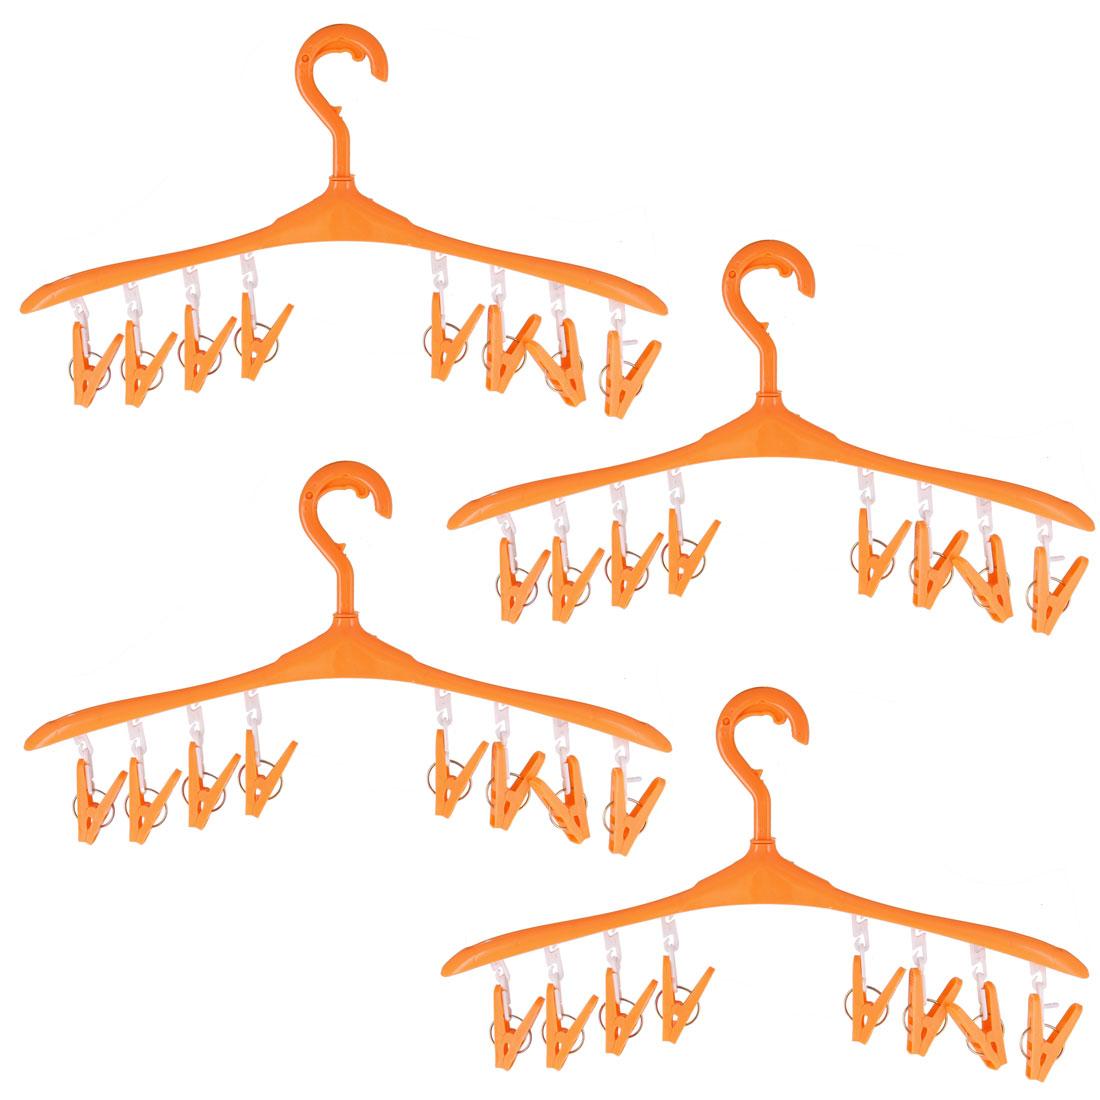 Plastic 8 Clips Nonslip Drying Rack Clothes Socks Pants Hanger Orange 4pcs